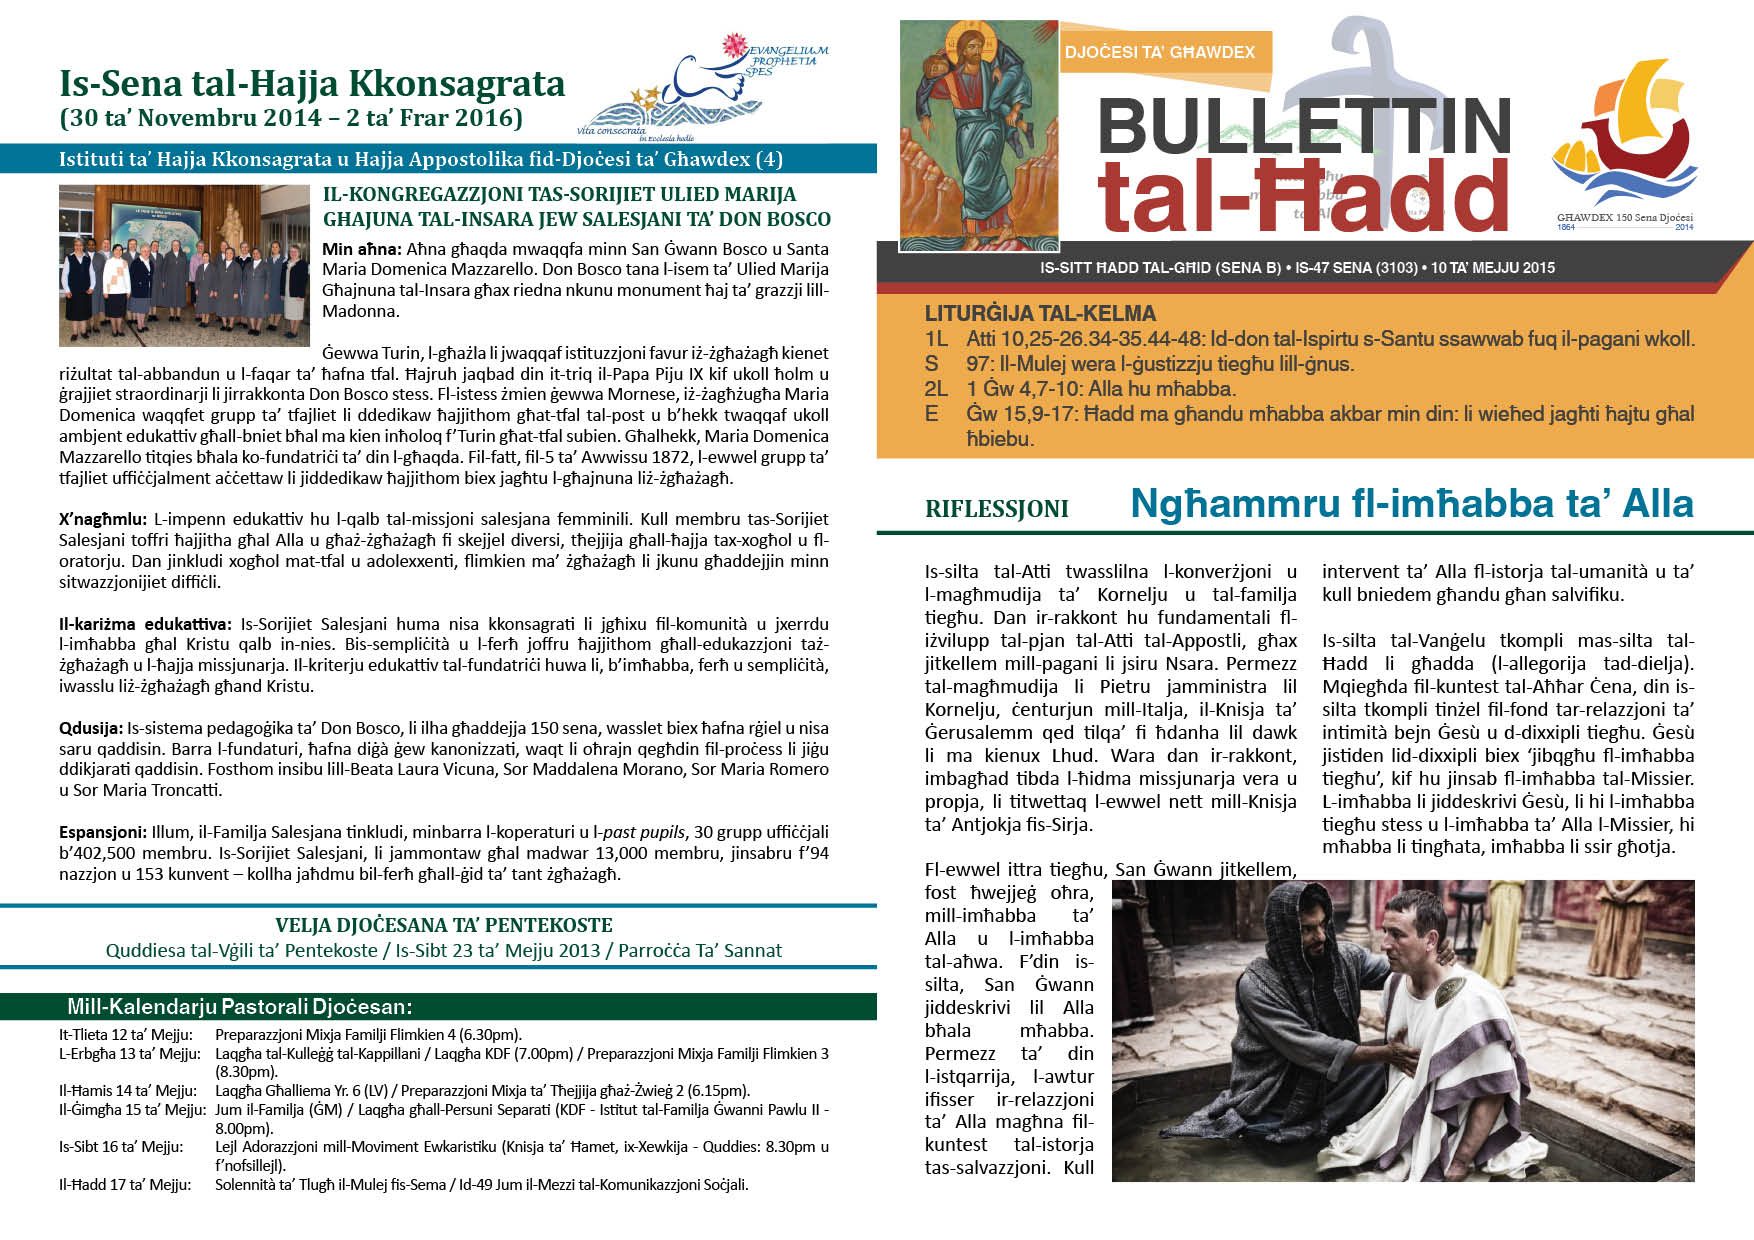 bullettin-2015-mejju-10.jpg